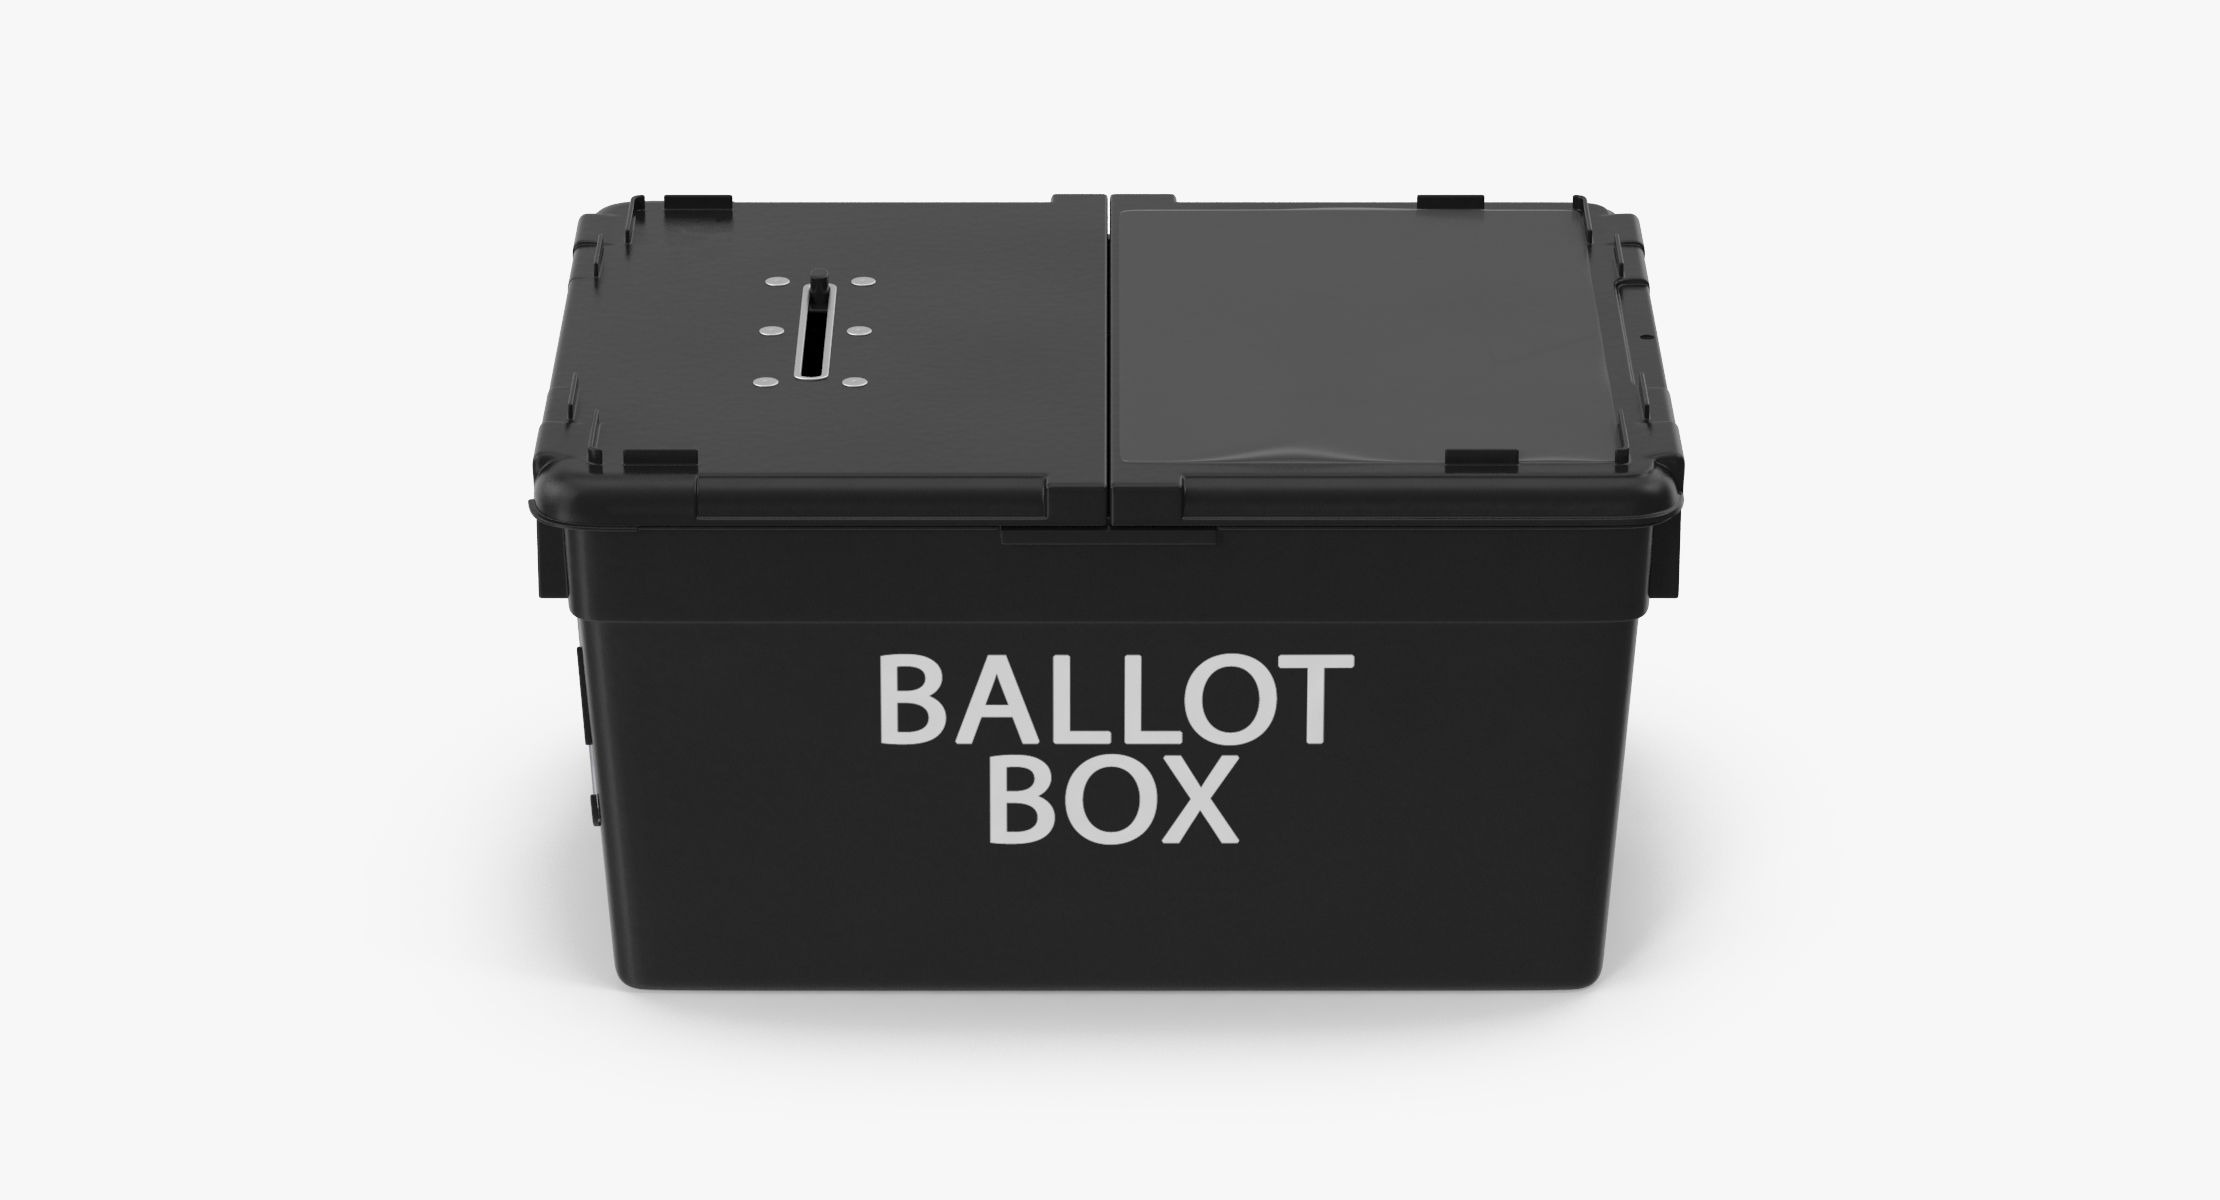 Ballot Box - reel 1